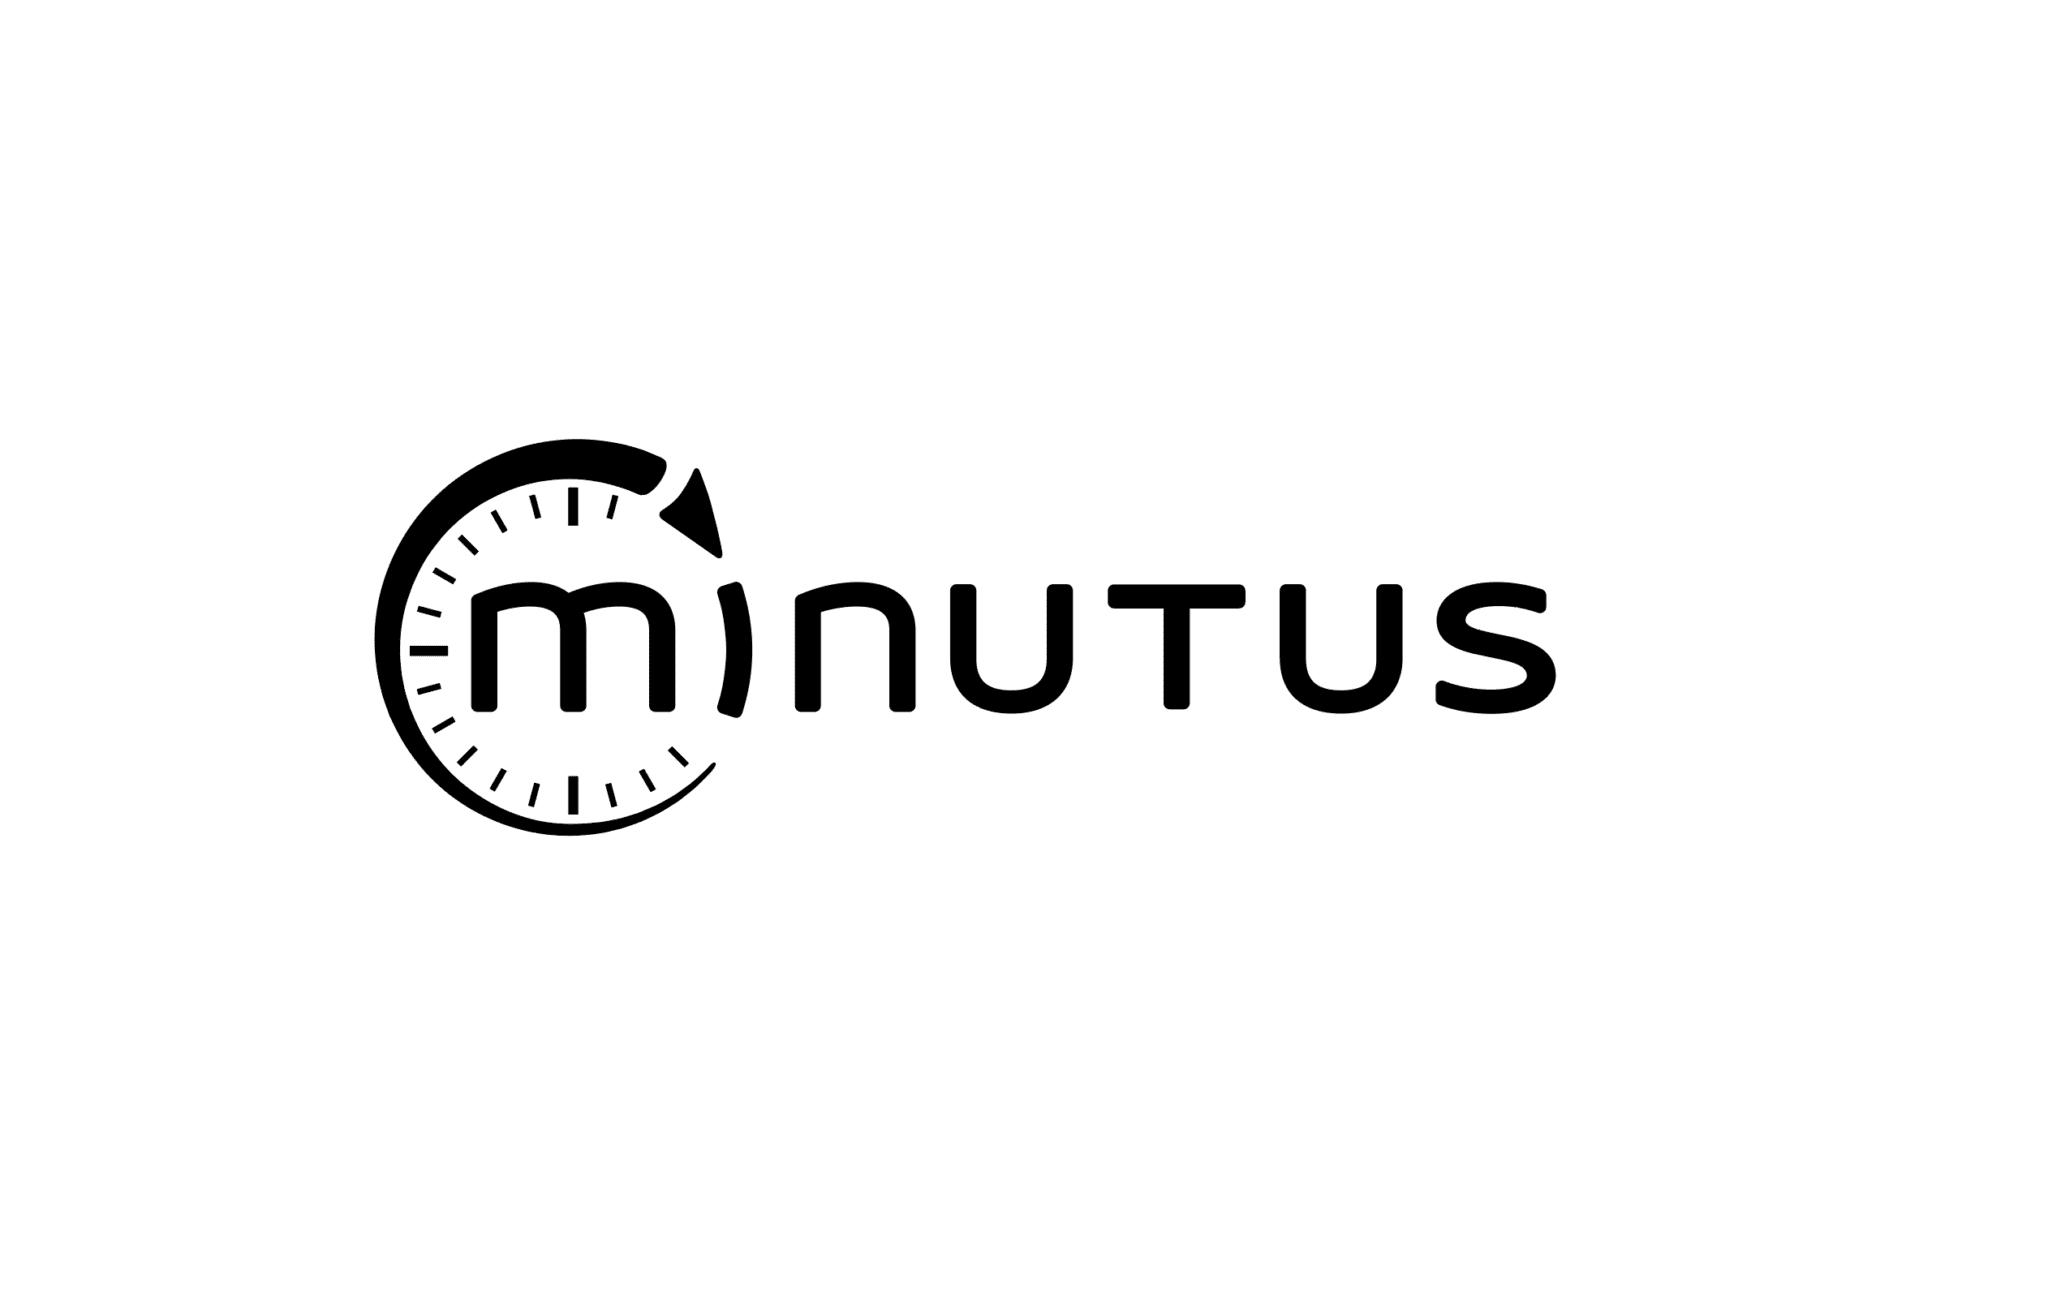 Minutus